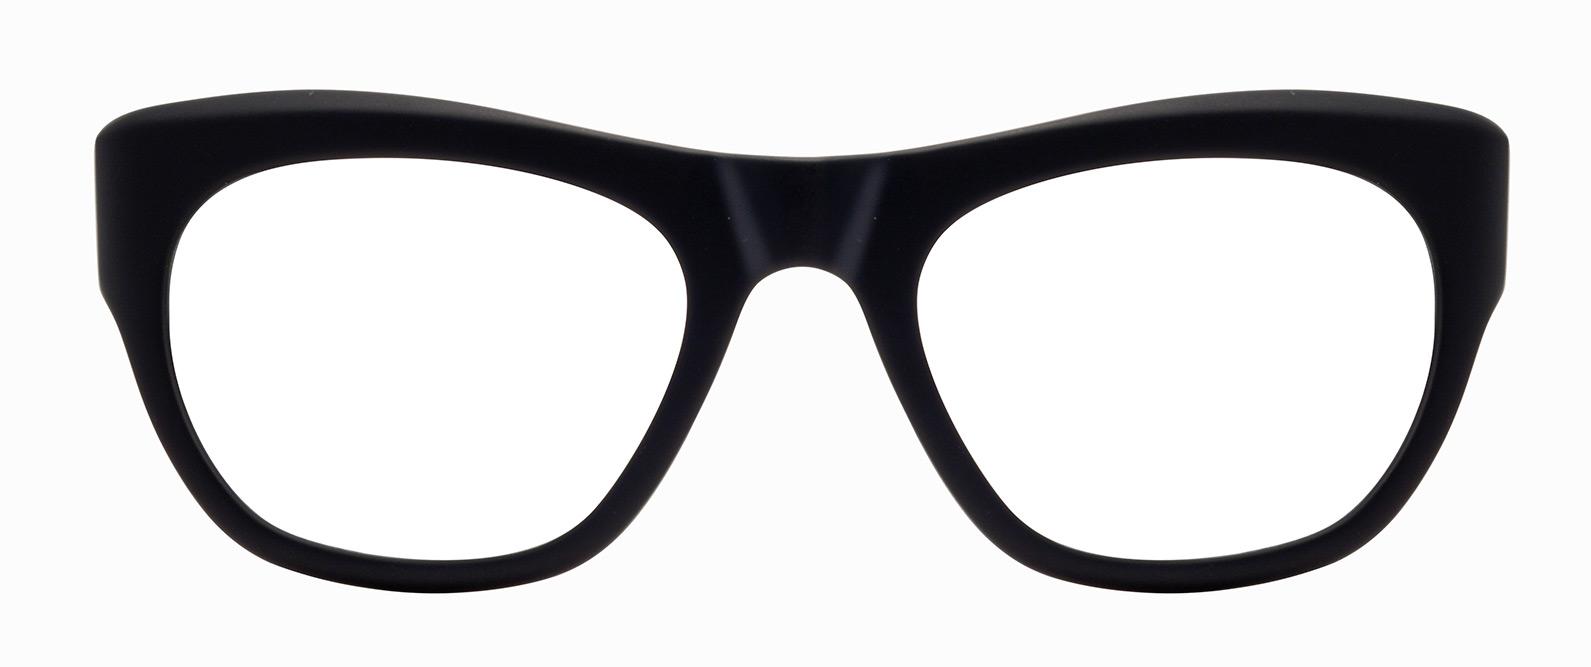 moscot-eyewear-ss2013-24